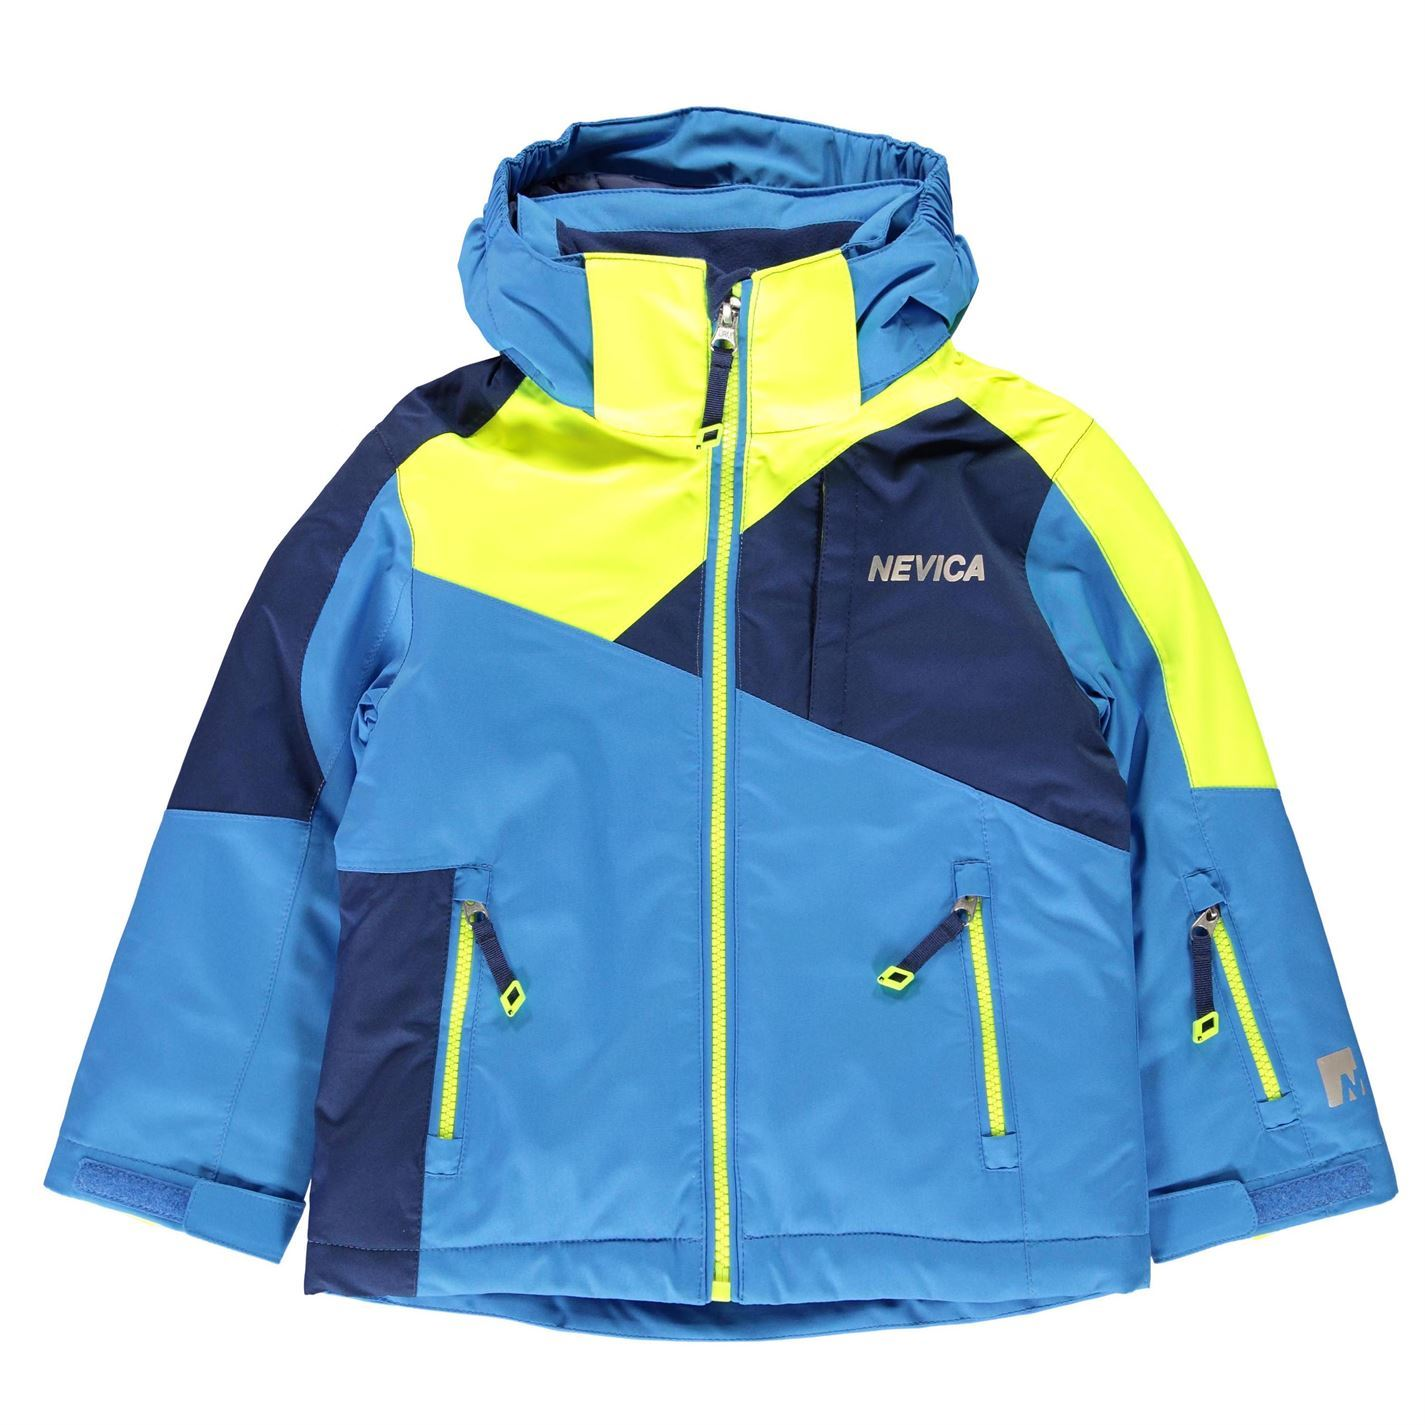 ... Nevica Meribel Jacket Infants Boys Snow Coat Skiing Outerwear ... ae6090ec60b